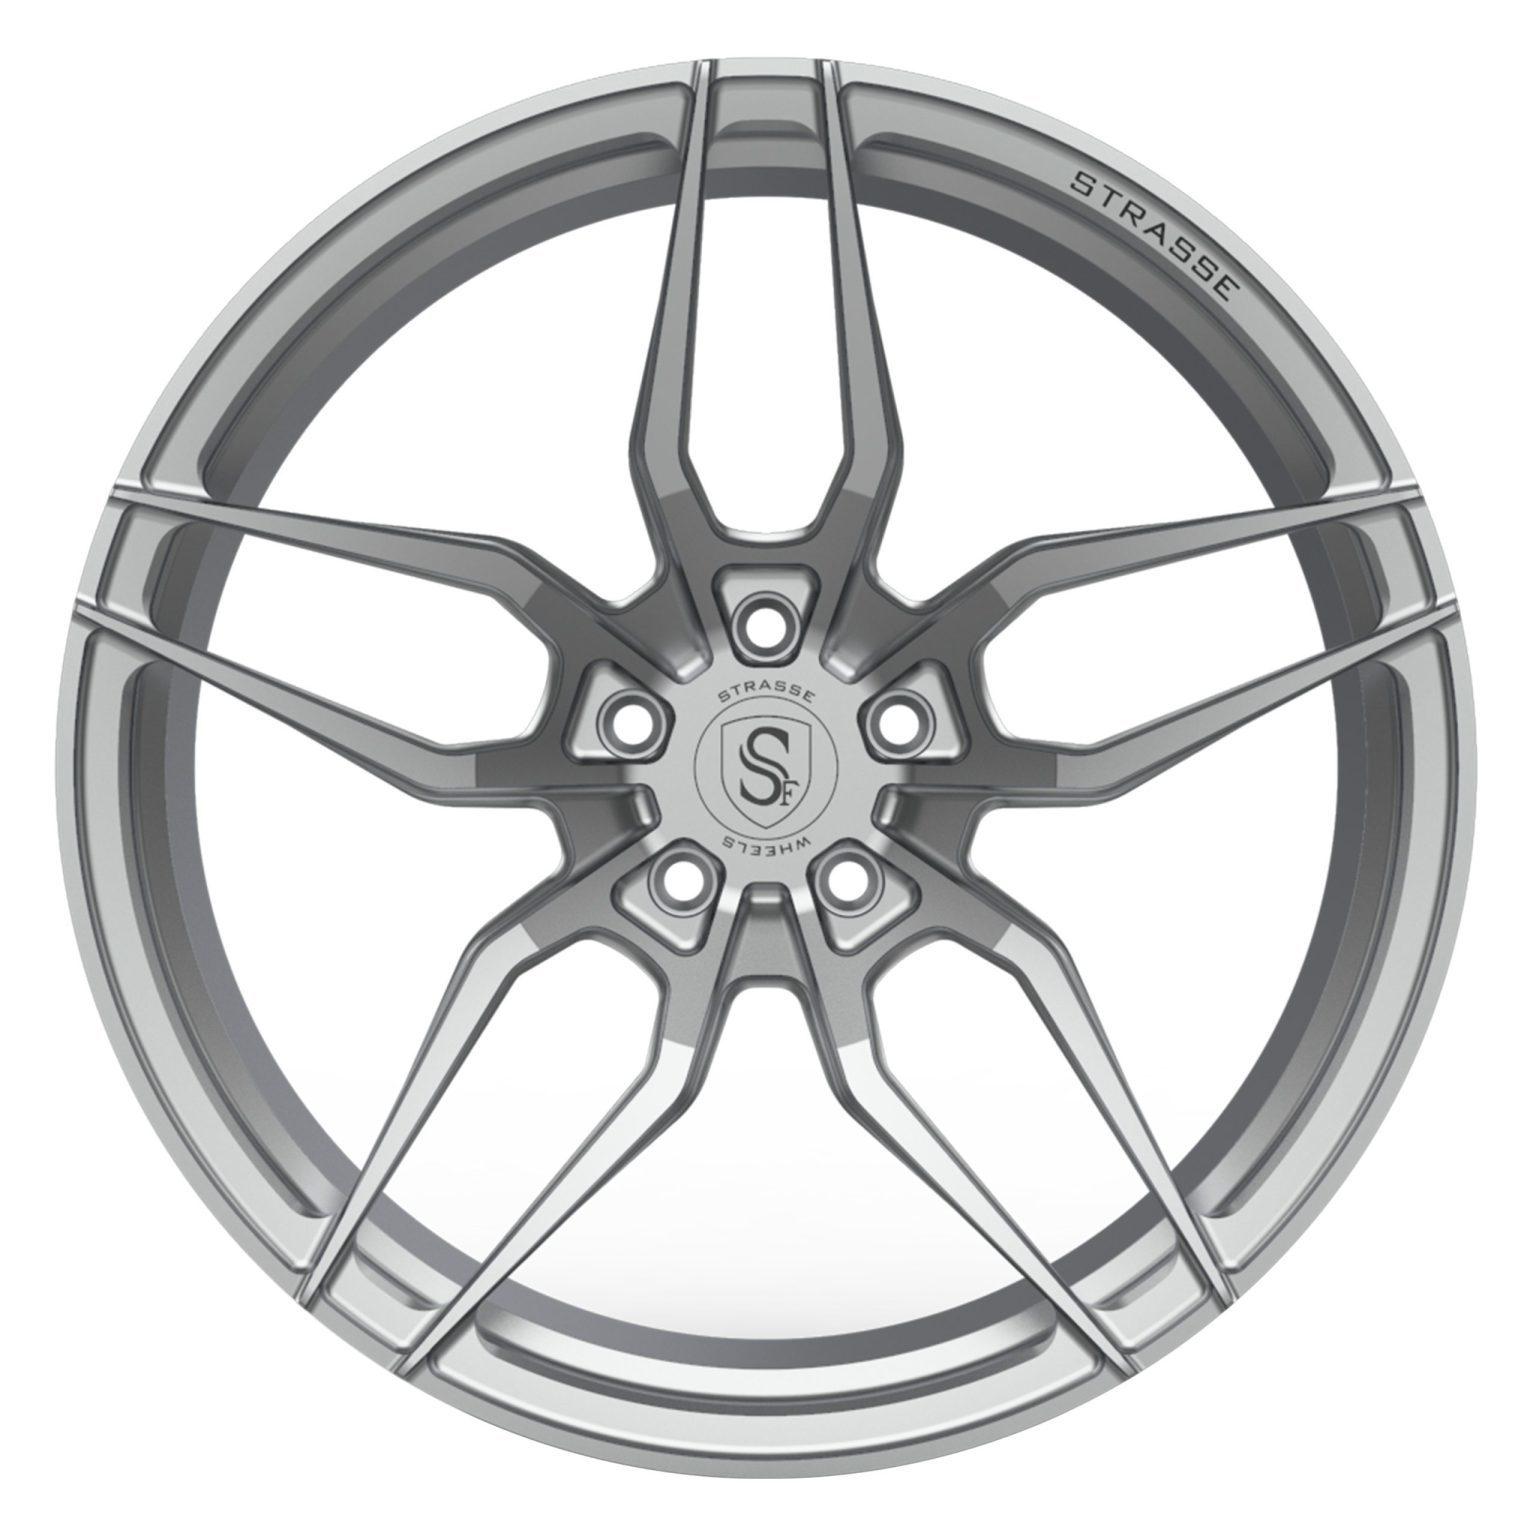 Strasse SV4 DEEP CONCAVE Monoblock  forged  wheels